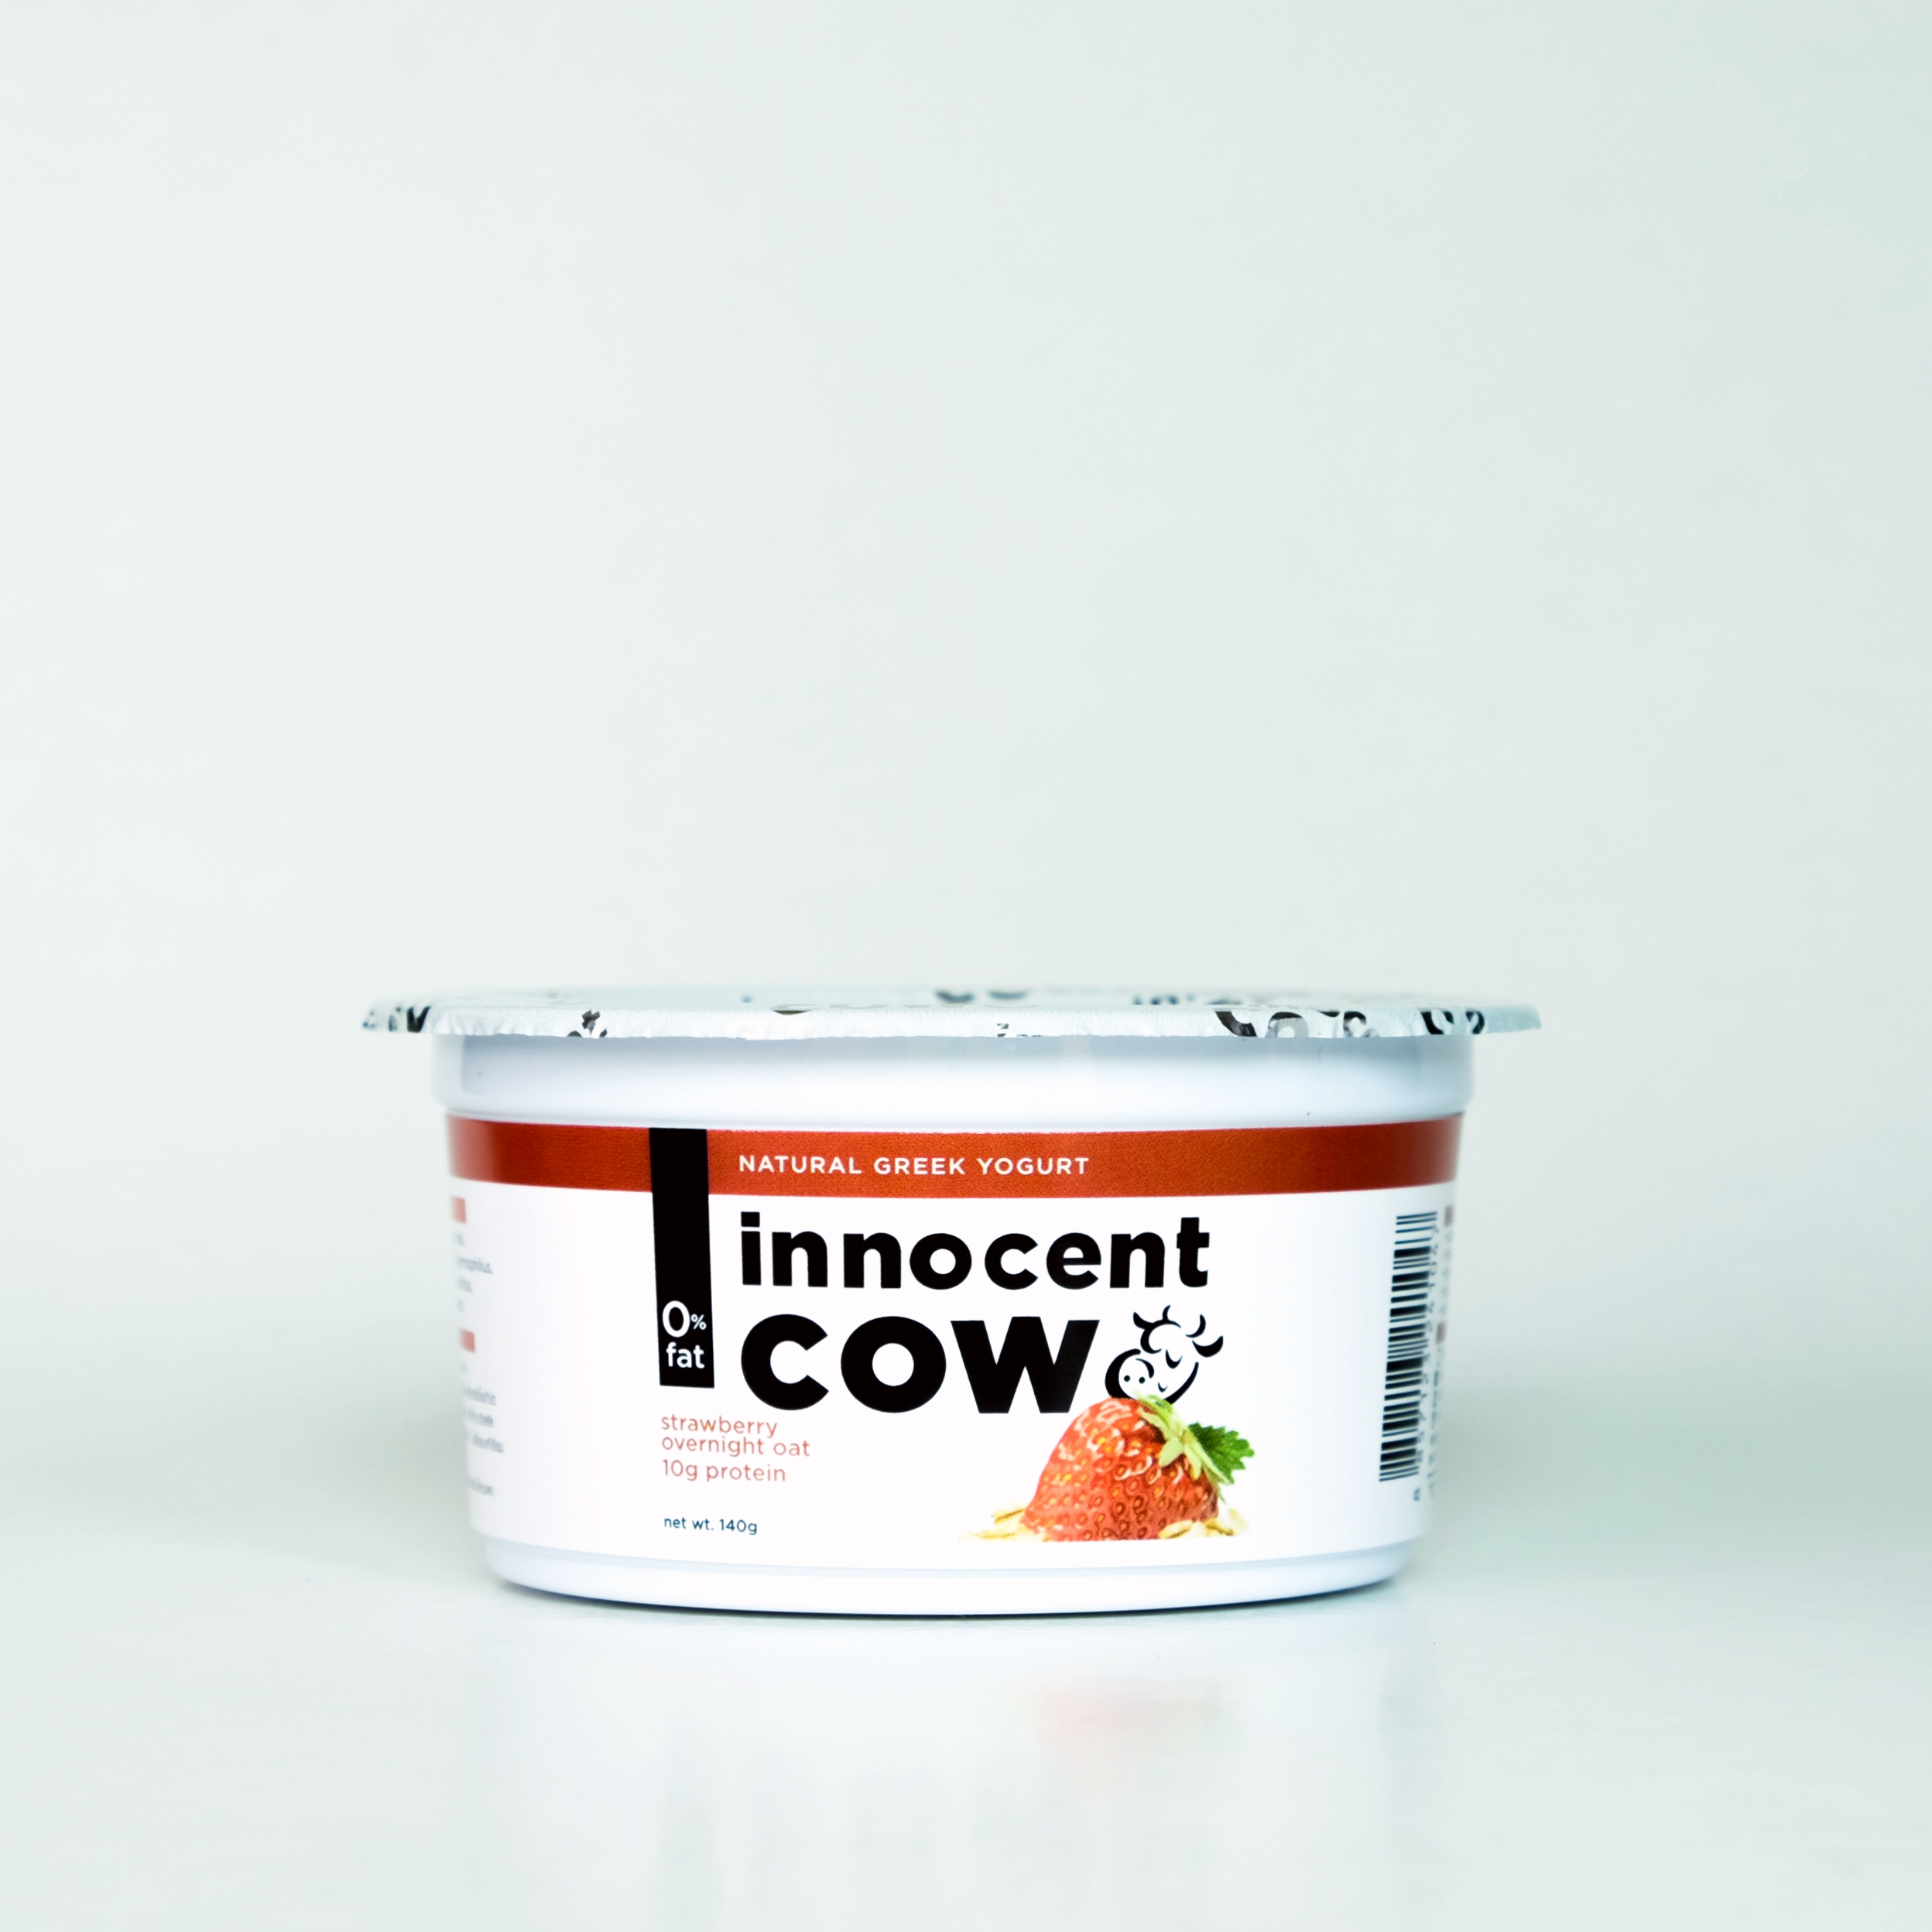 innocentcow - strawberry overnight oats 140g